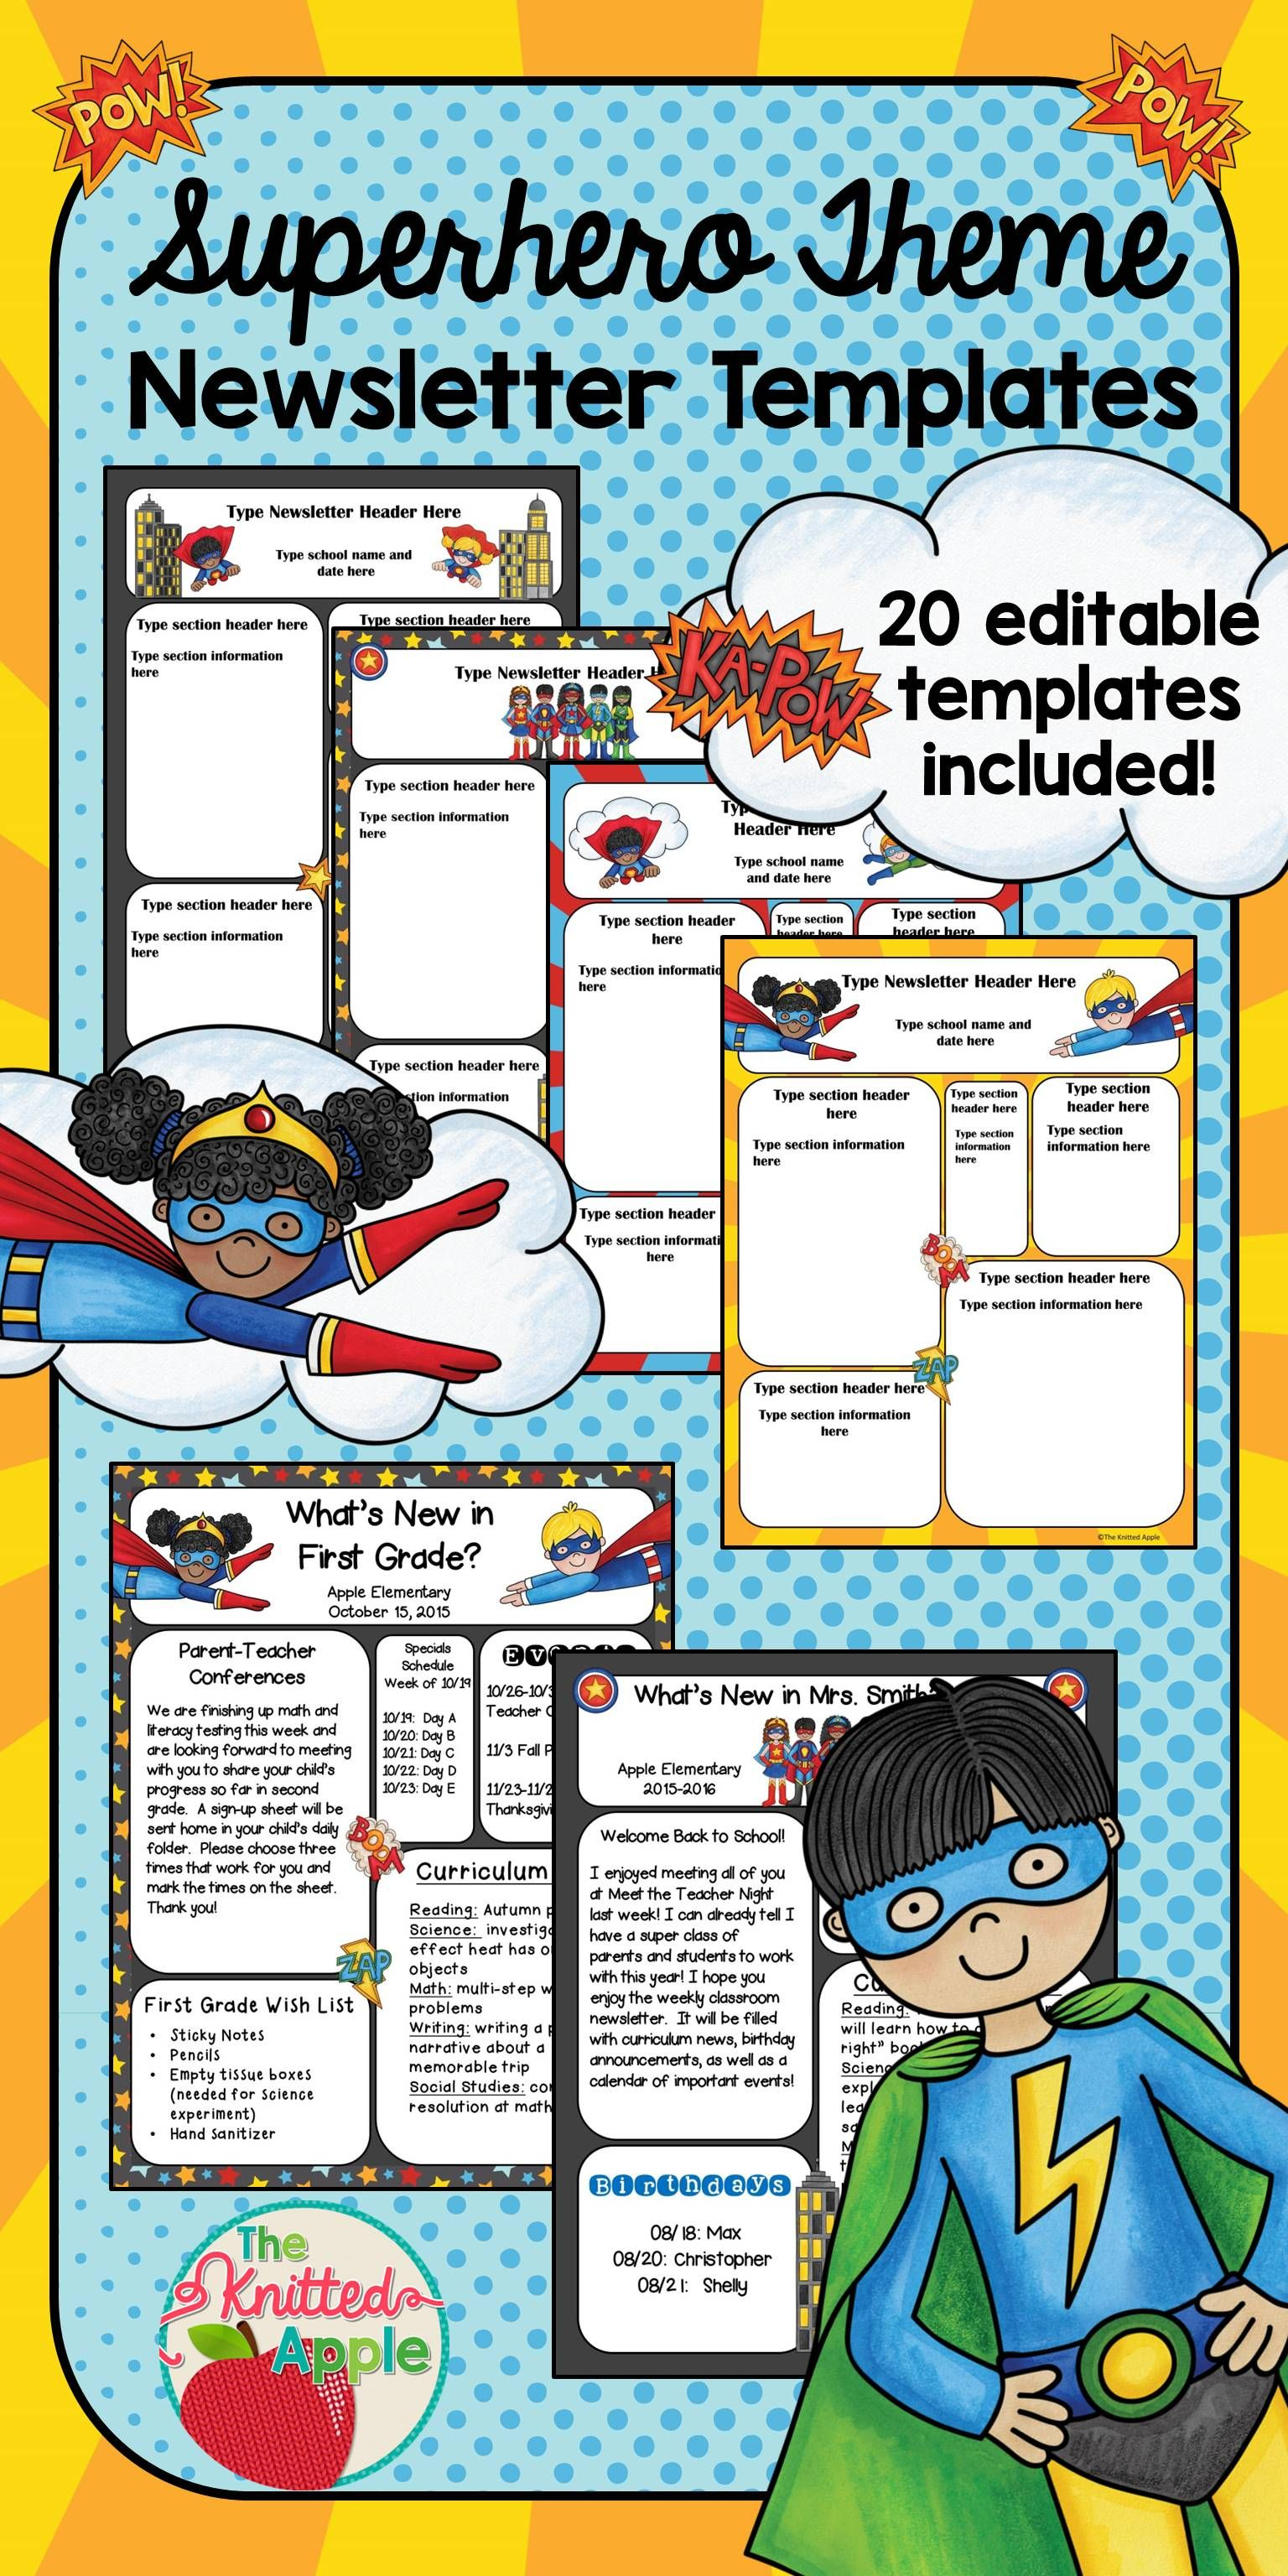 Worksheets Superhero Teacher Worksheets superhero themed newsletter templates editable for your theme classroom